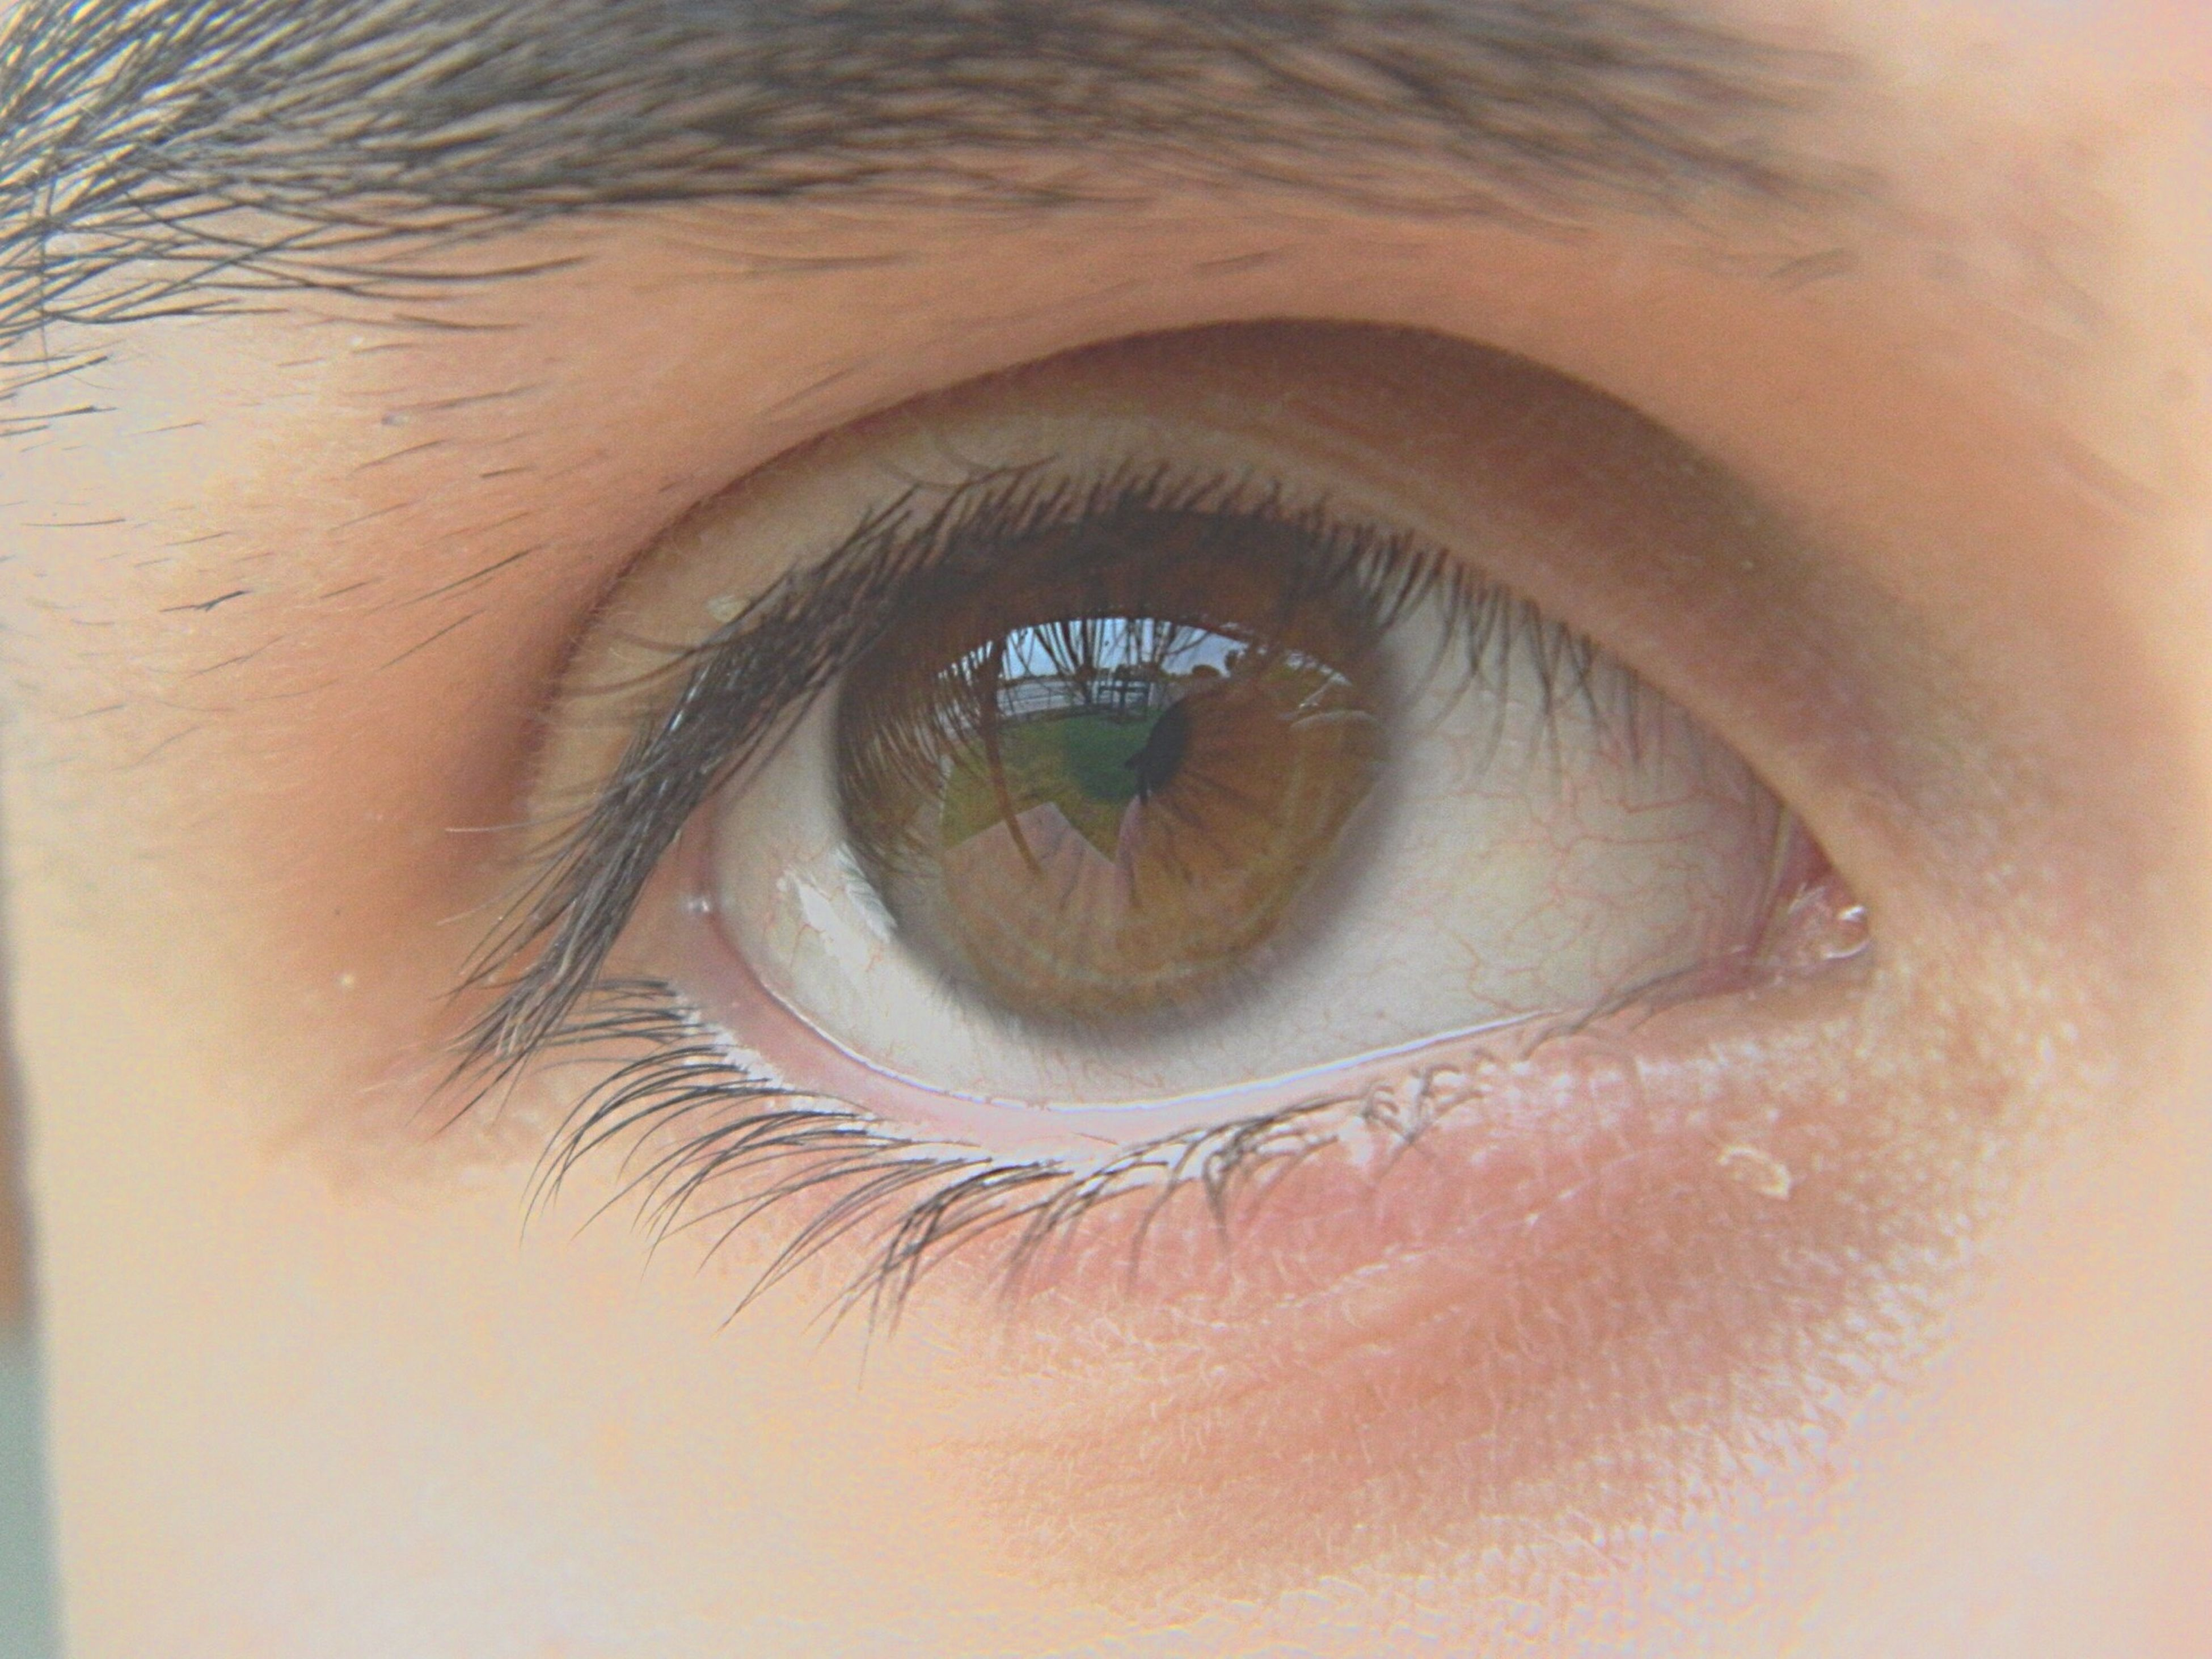 human eye, close-up, eyelash, eyesight, looking at camera, portrait, full frame, part of, sensory perception, reflection, indoors, human face, extreme close-up, circle, lifestyles, eyeball, digital composite